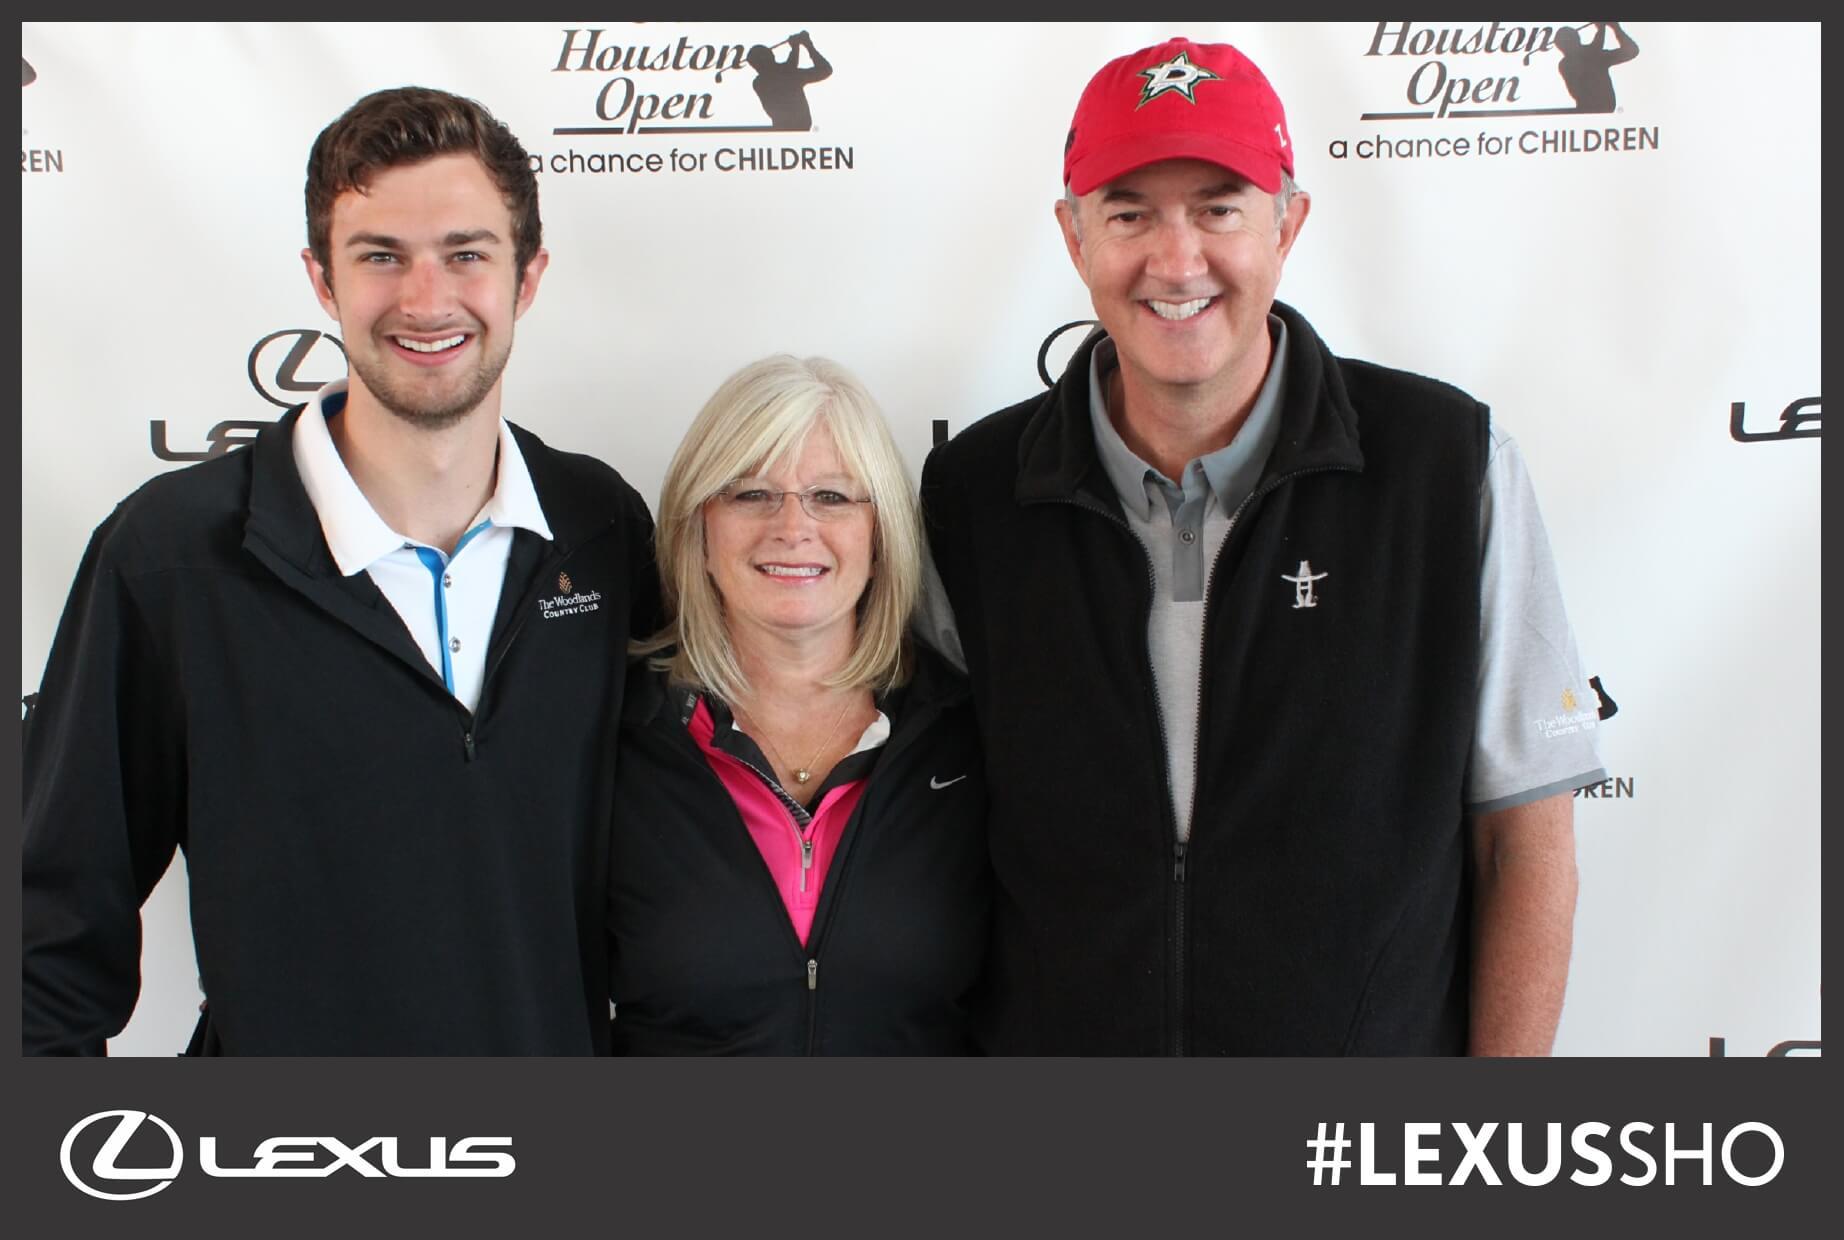 PGA Houston Shell Open photo booth